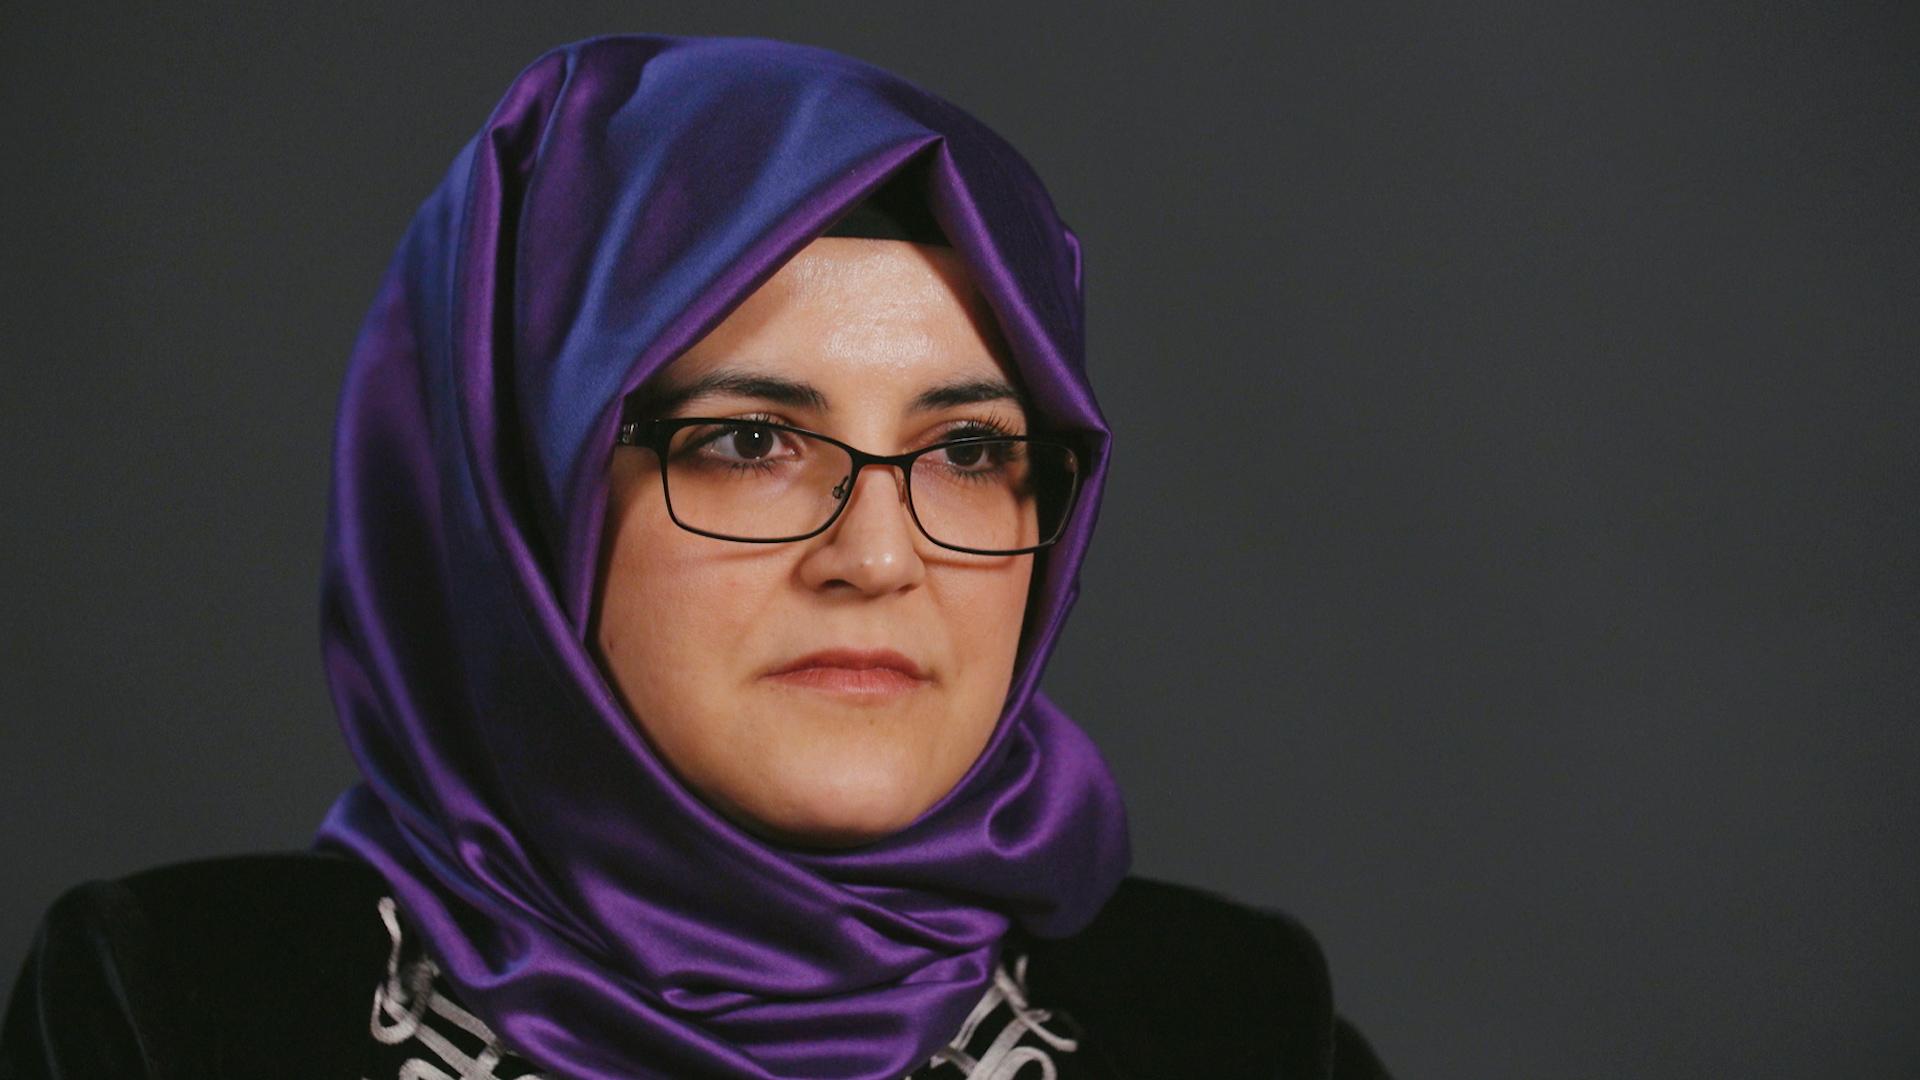 Federal court presses Trump administration to release Khashoggi documents